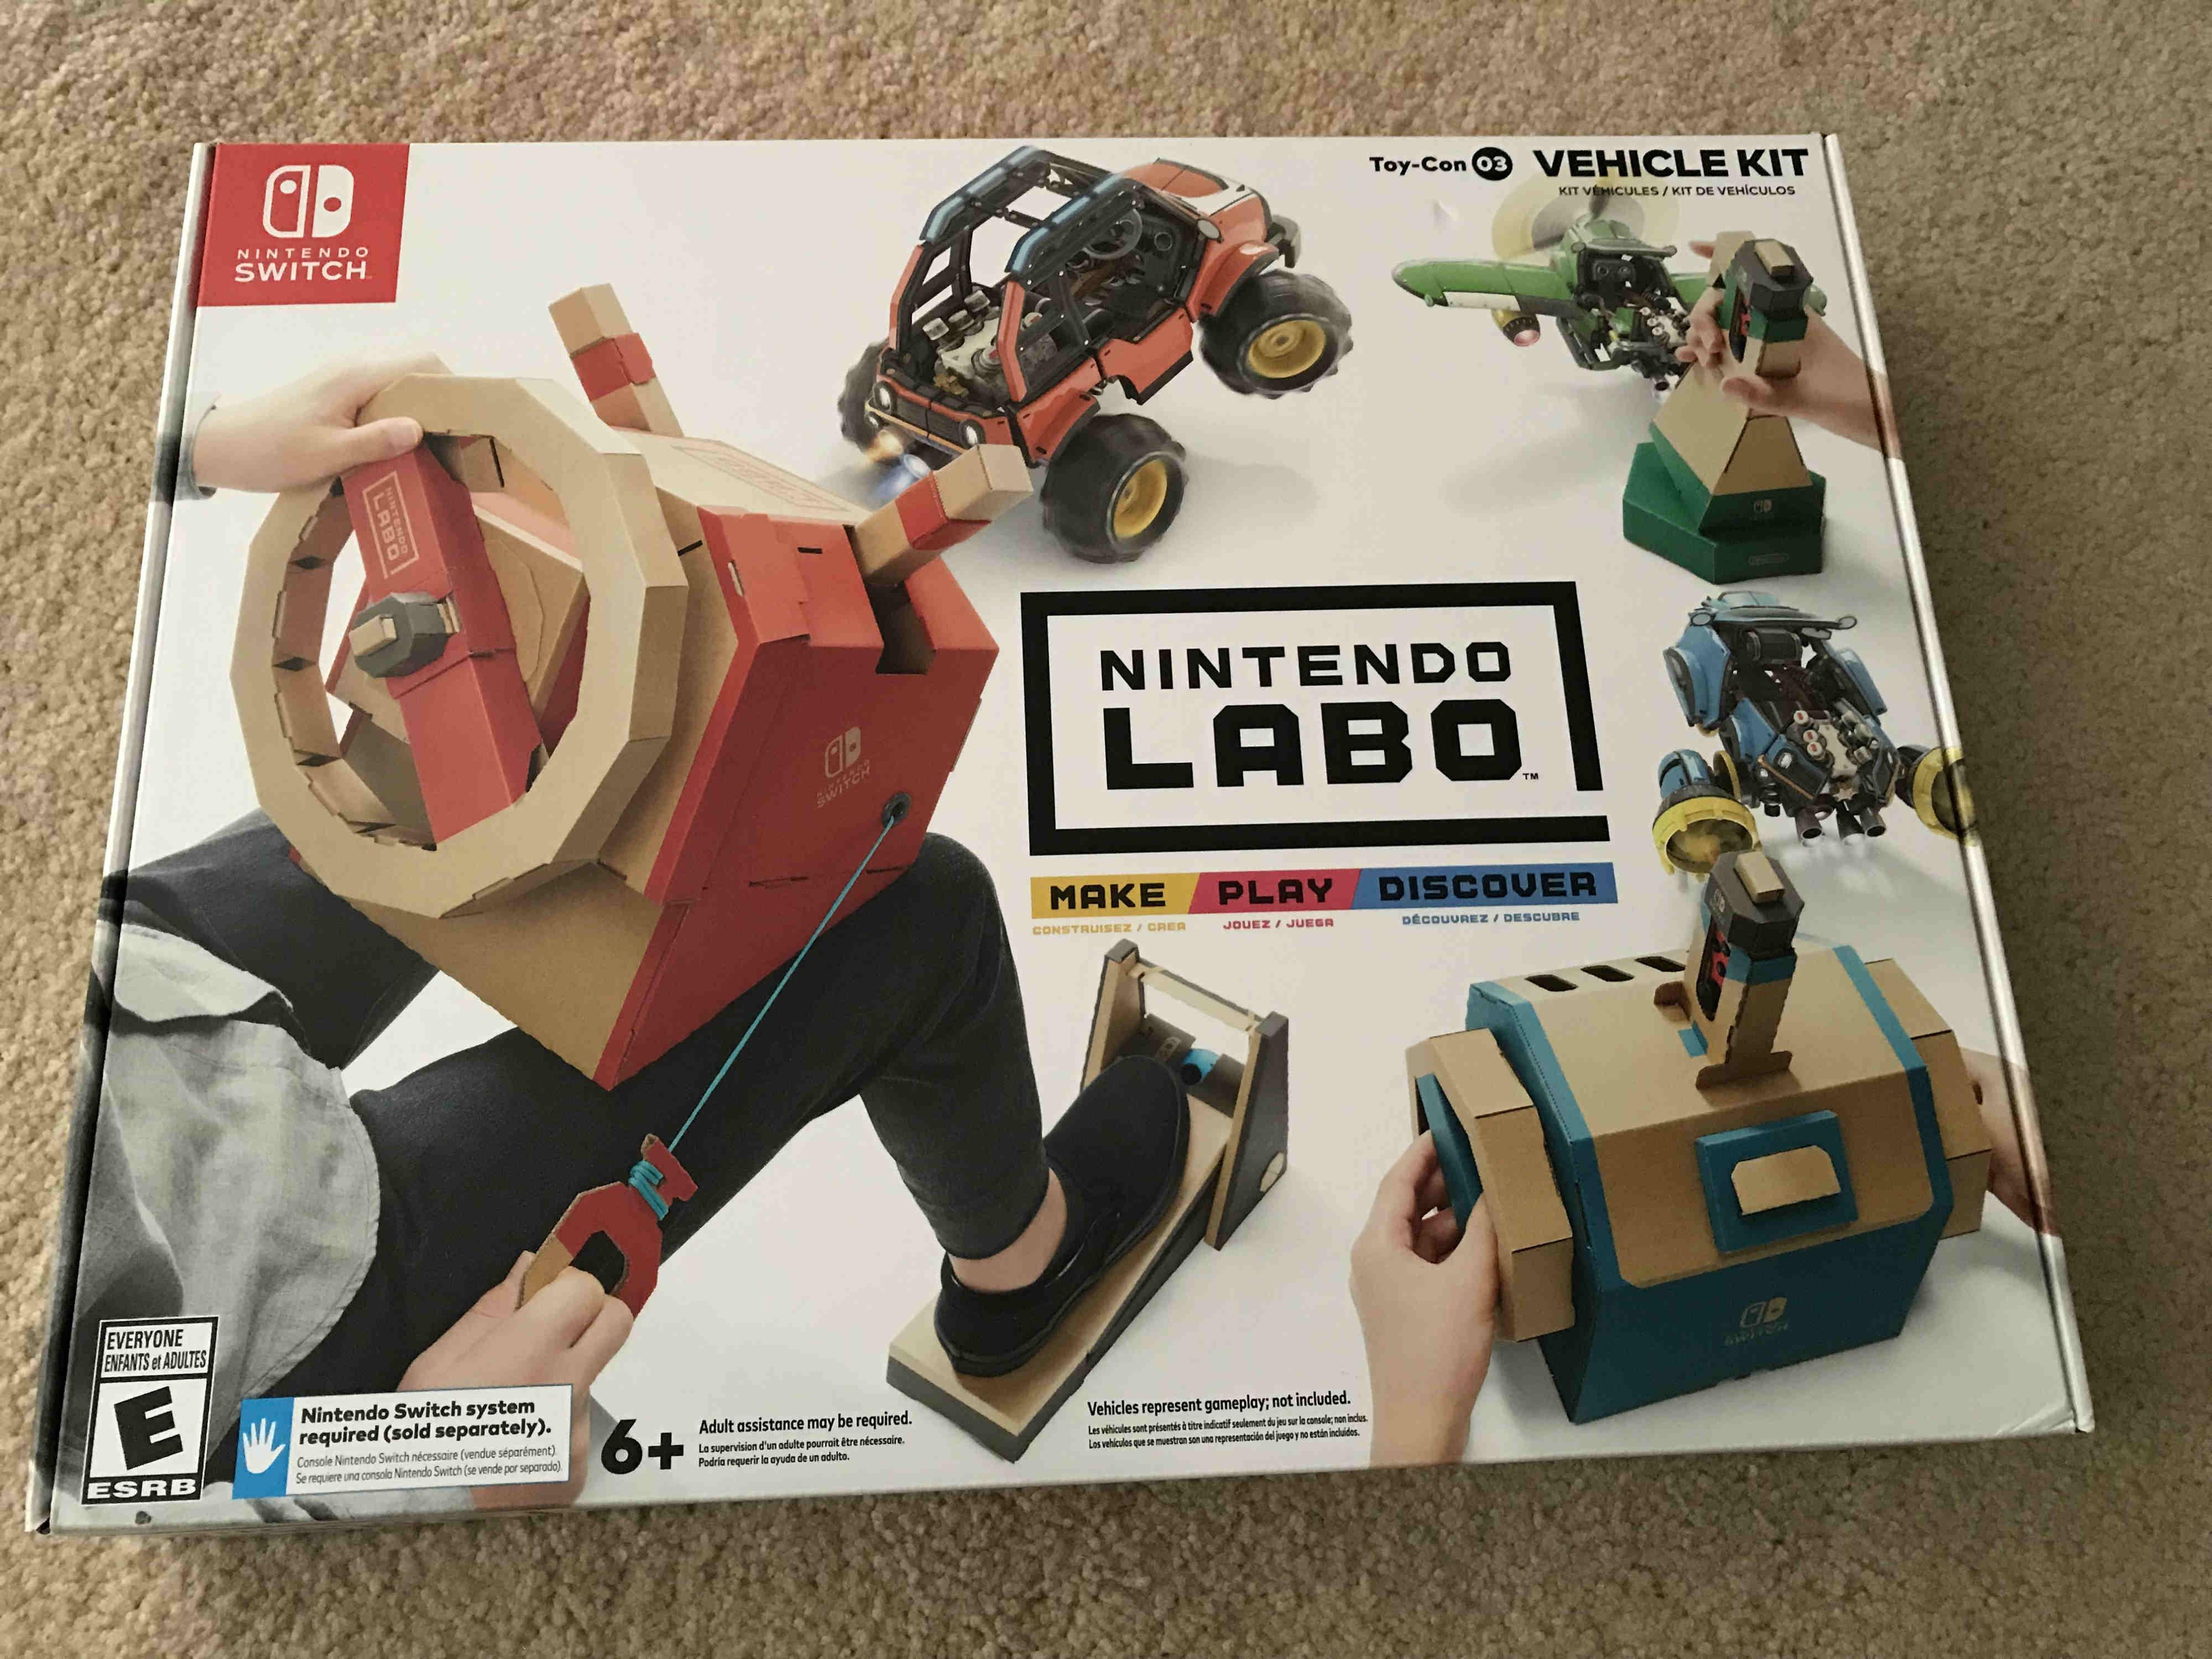 Review: Nintendo Labo: Toycon 03 Vehicle Kit screenshot